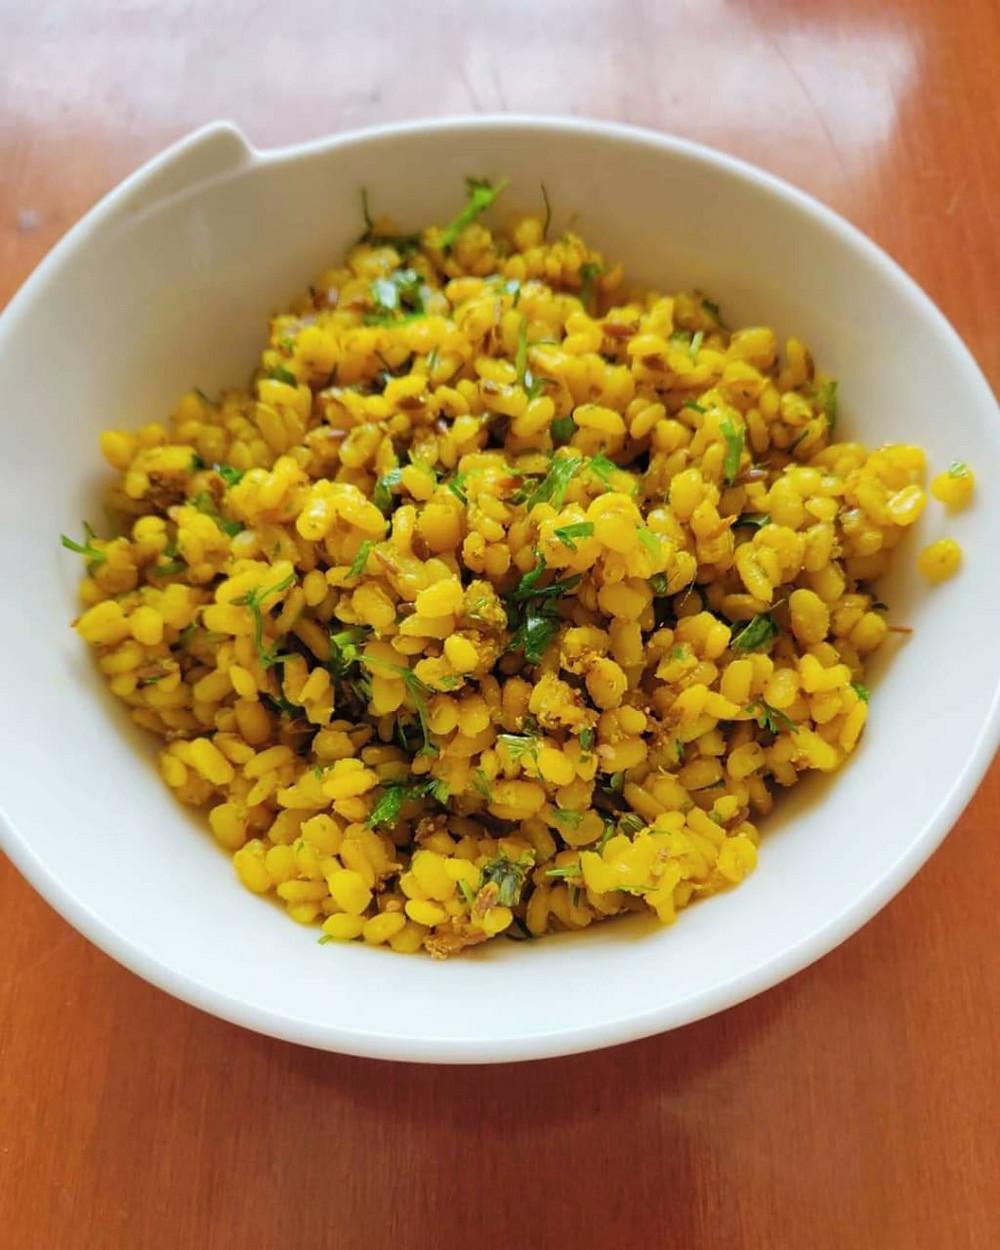 health pantry, indian, probitoic, high protein, ghee, immune boosting, low carb dinner recipes, healthy recipes, saatvik recipes, khushboo jain tibrewala, nutritionist, diet coach, mumbai, gut friendly, vegan foods, green gram, moong daql sautee, chuki hui moong ki dal, delhi snack recipes, healthy vegan recipes, breakfast ideas